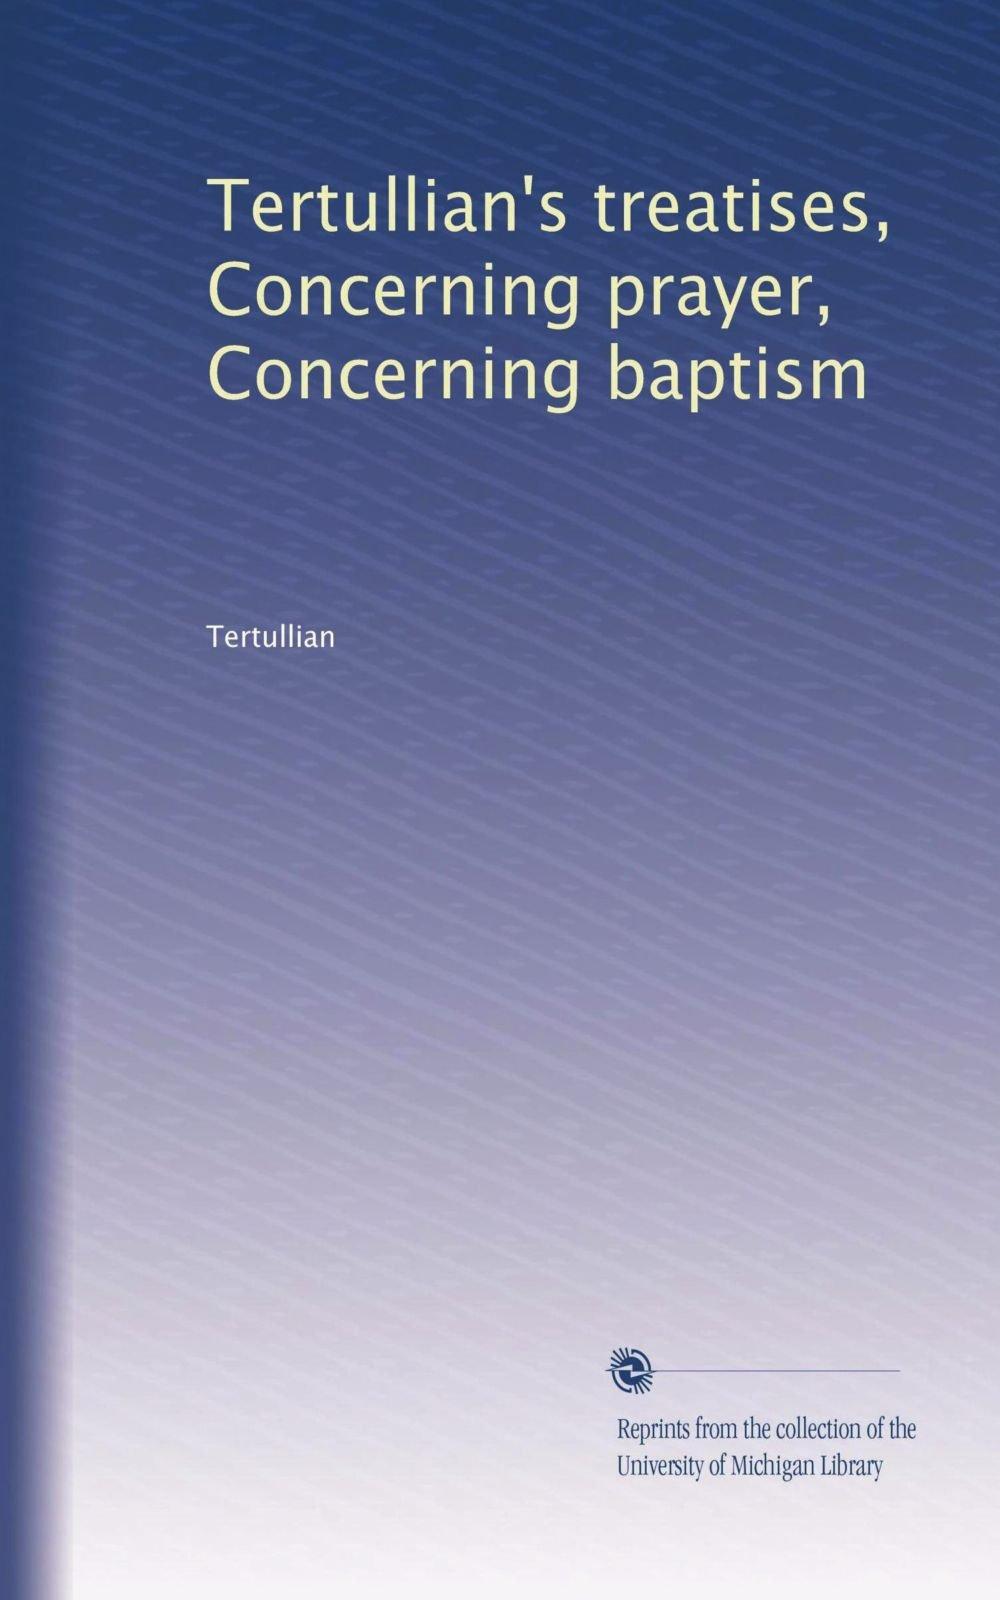 Tertullian's treatises, Concerning prayer, Concerning baptism